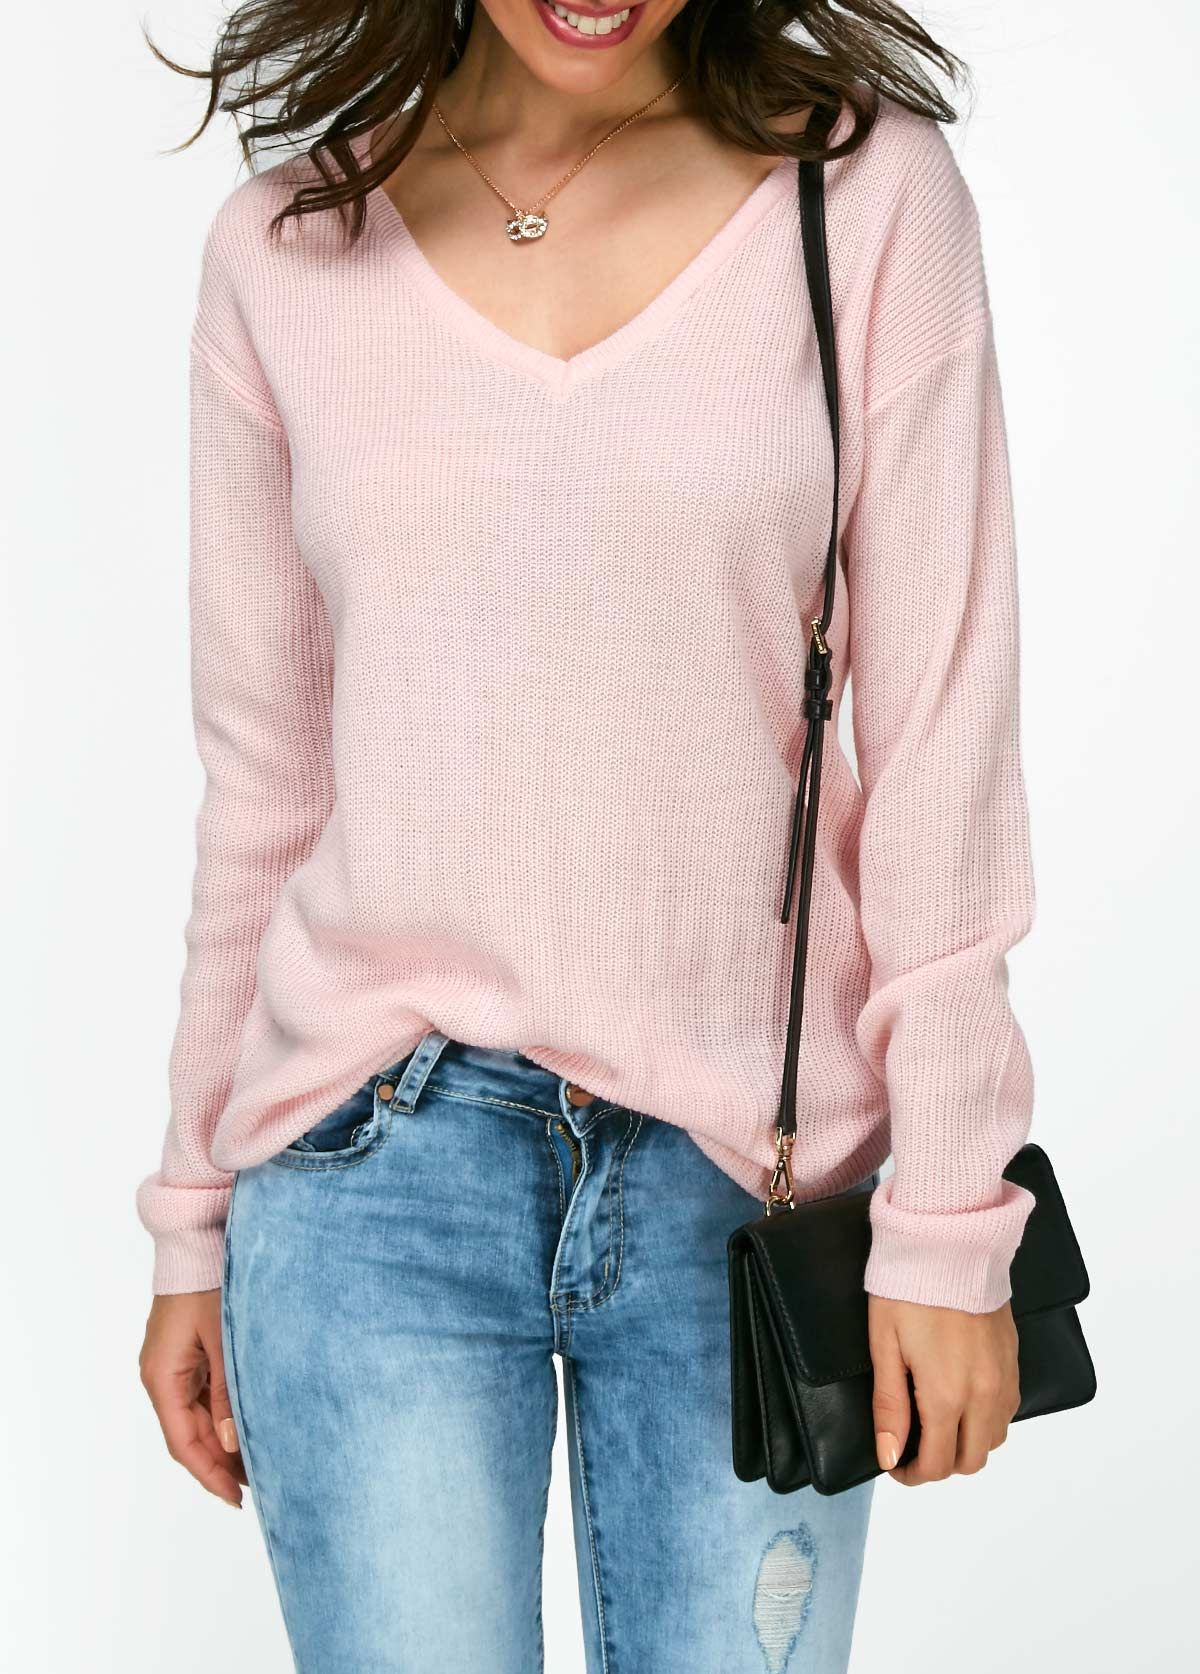 V Neck Long Sleeve Pink Sweater | Clothing